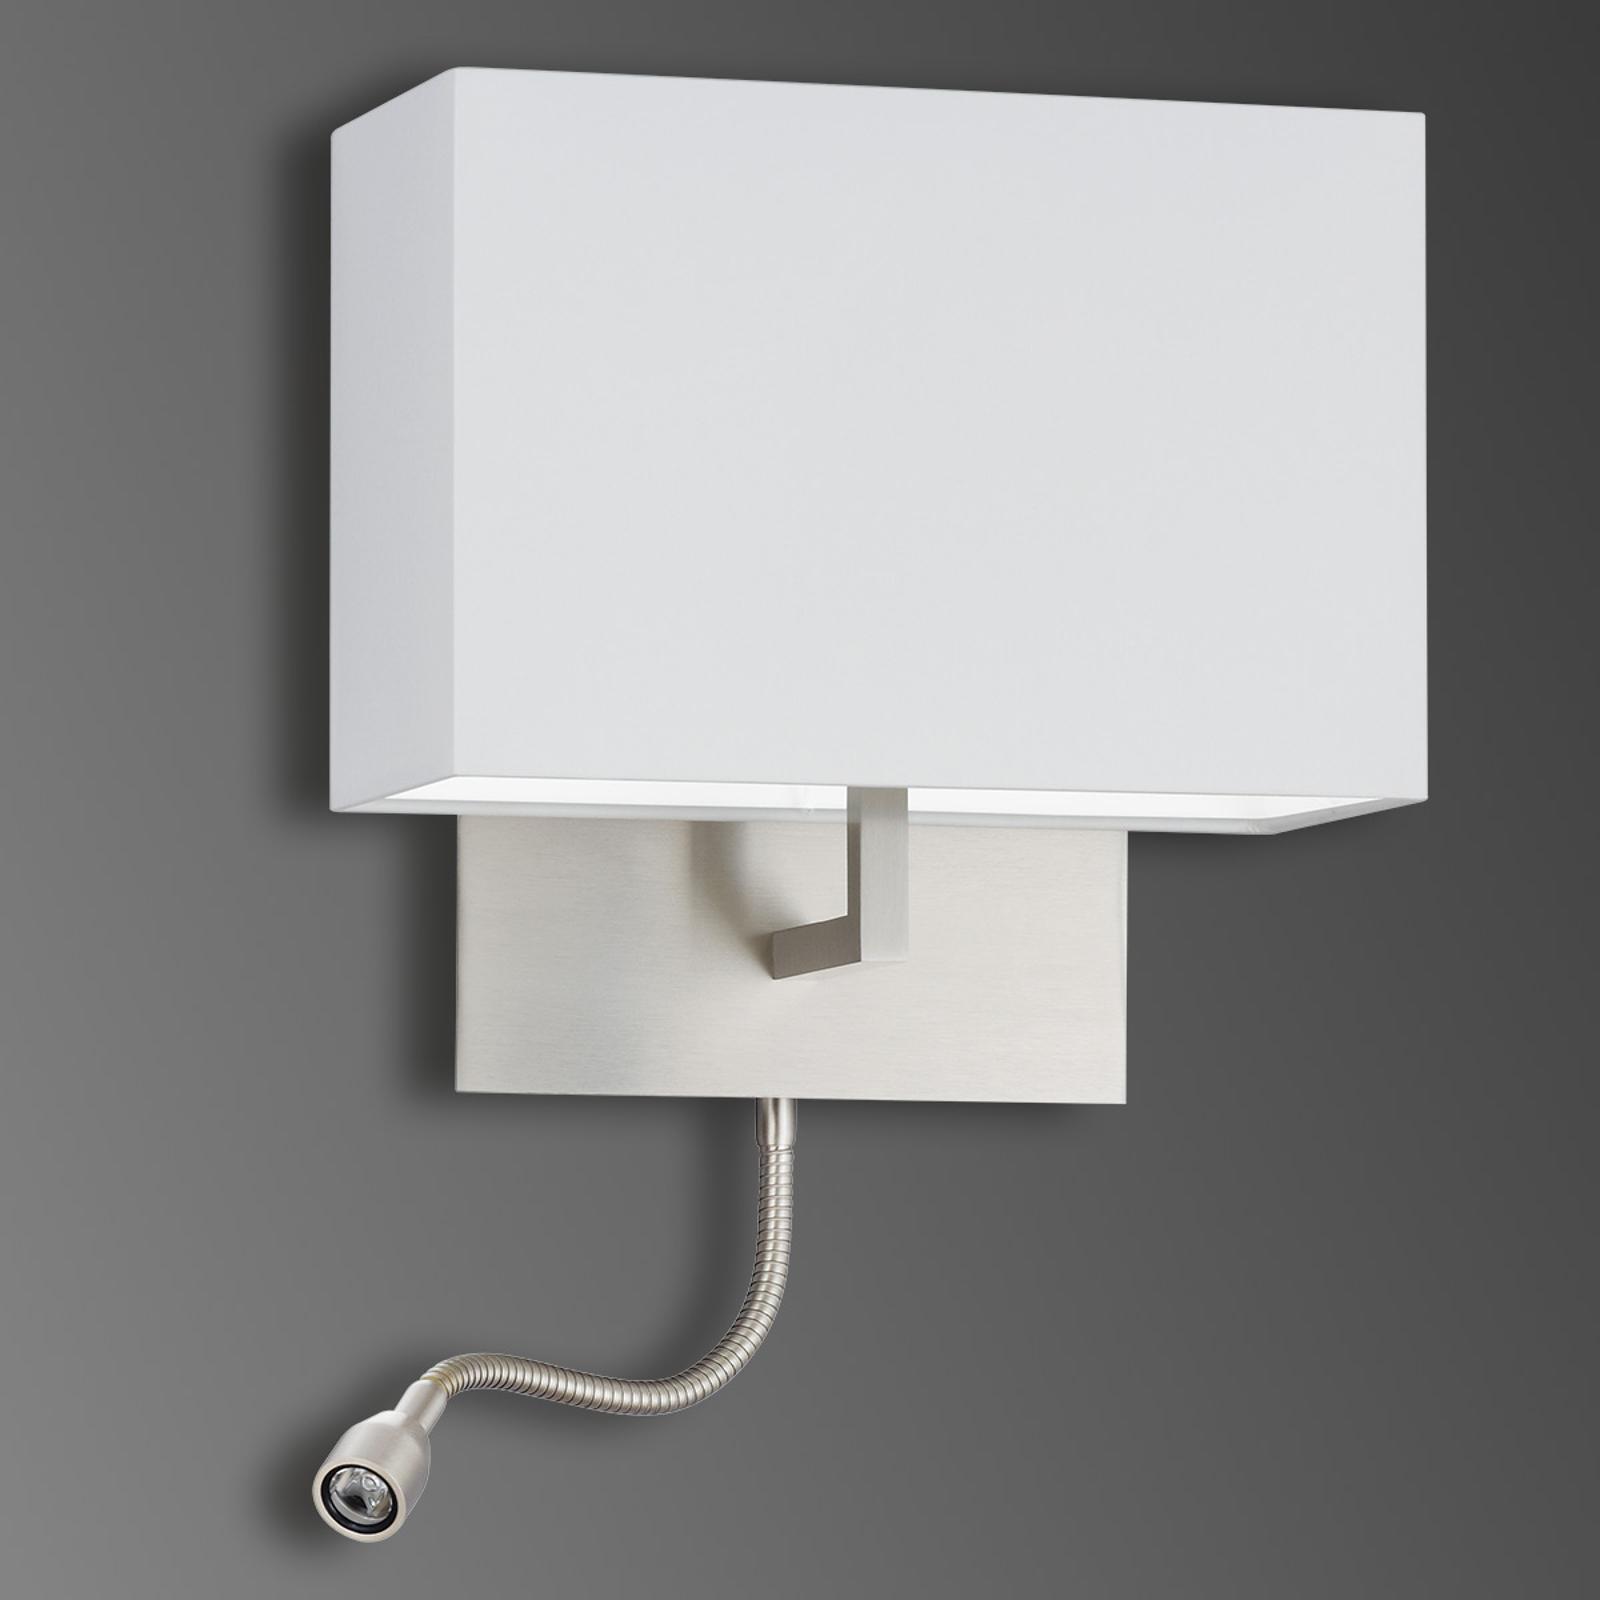 Chintz wall light Mikola with LED reading arm_4002603_1